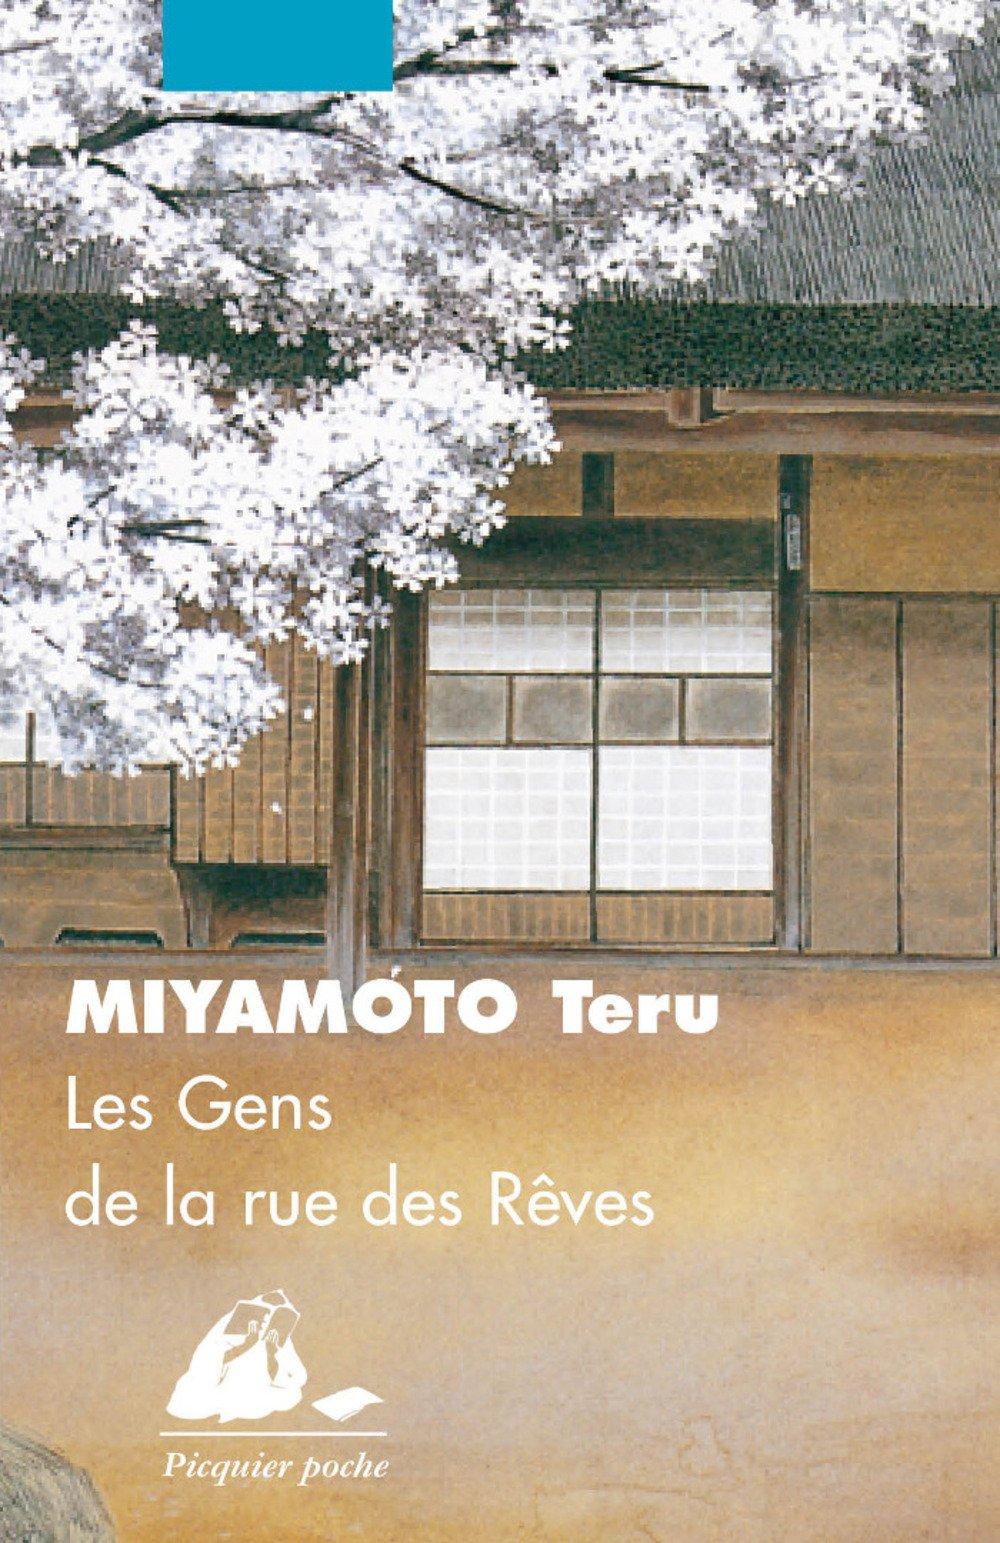 Les Gens de la rue des Rêves - Teru Miyamoto